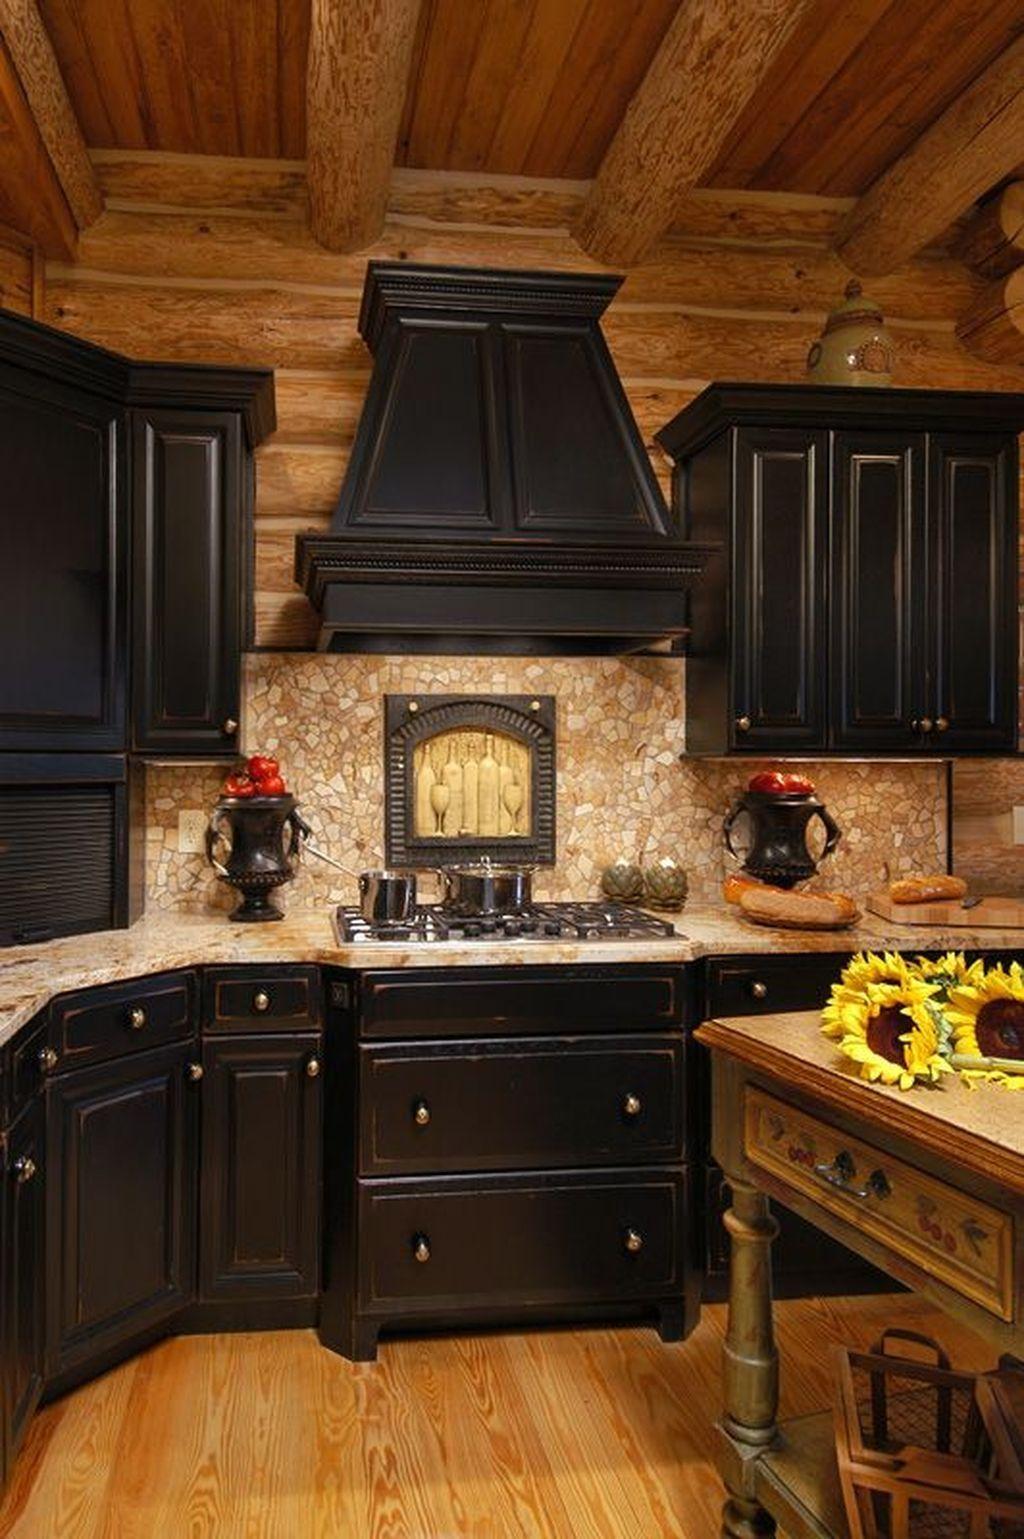 30 Popular Kitchen Color Scheme Ideas For Dark Cabinets Log Home Kitchens Log Home Interiors Log Cabin Kitchens